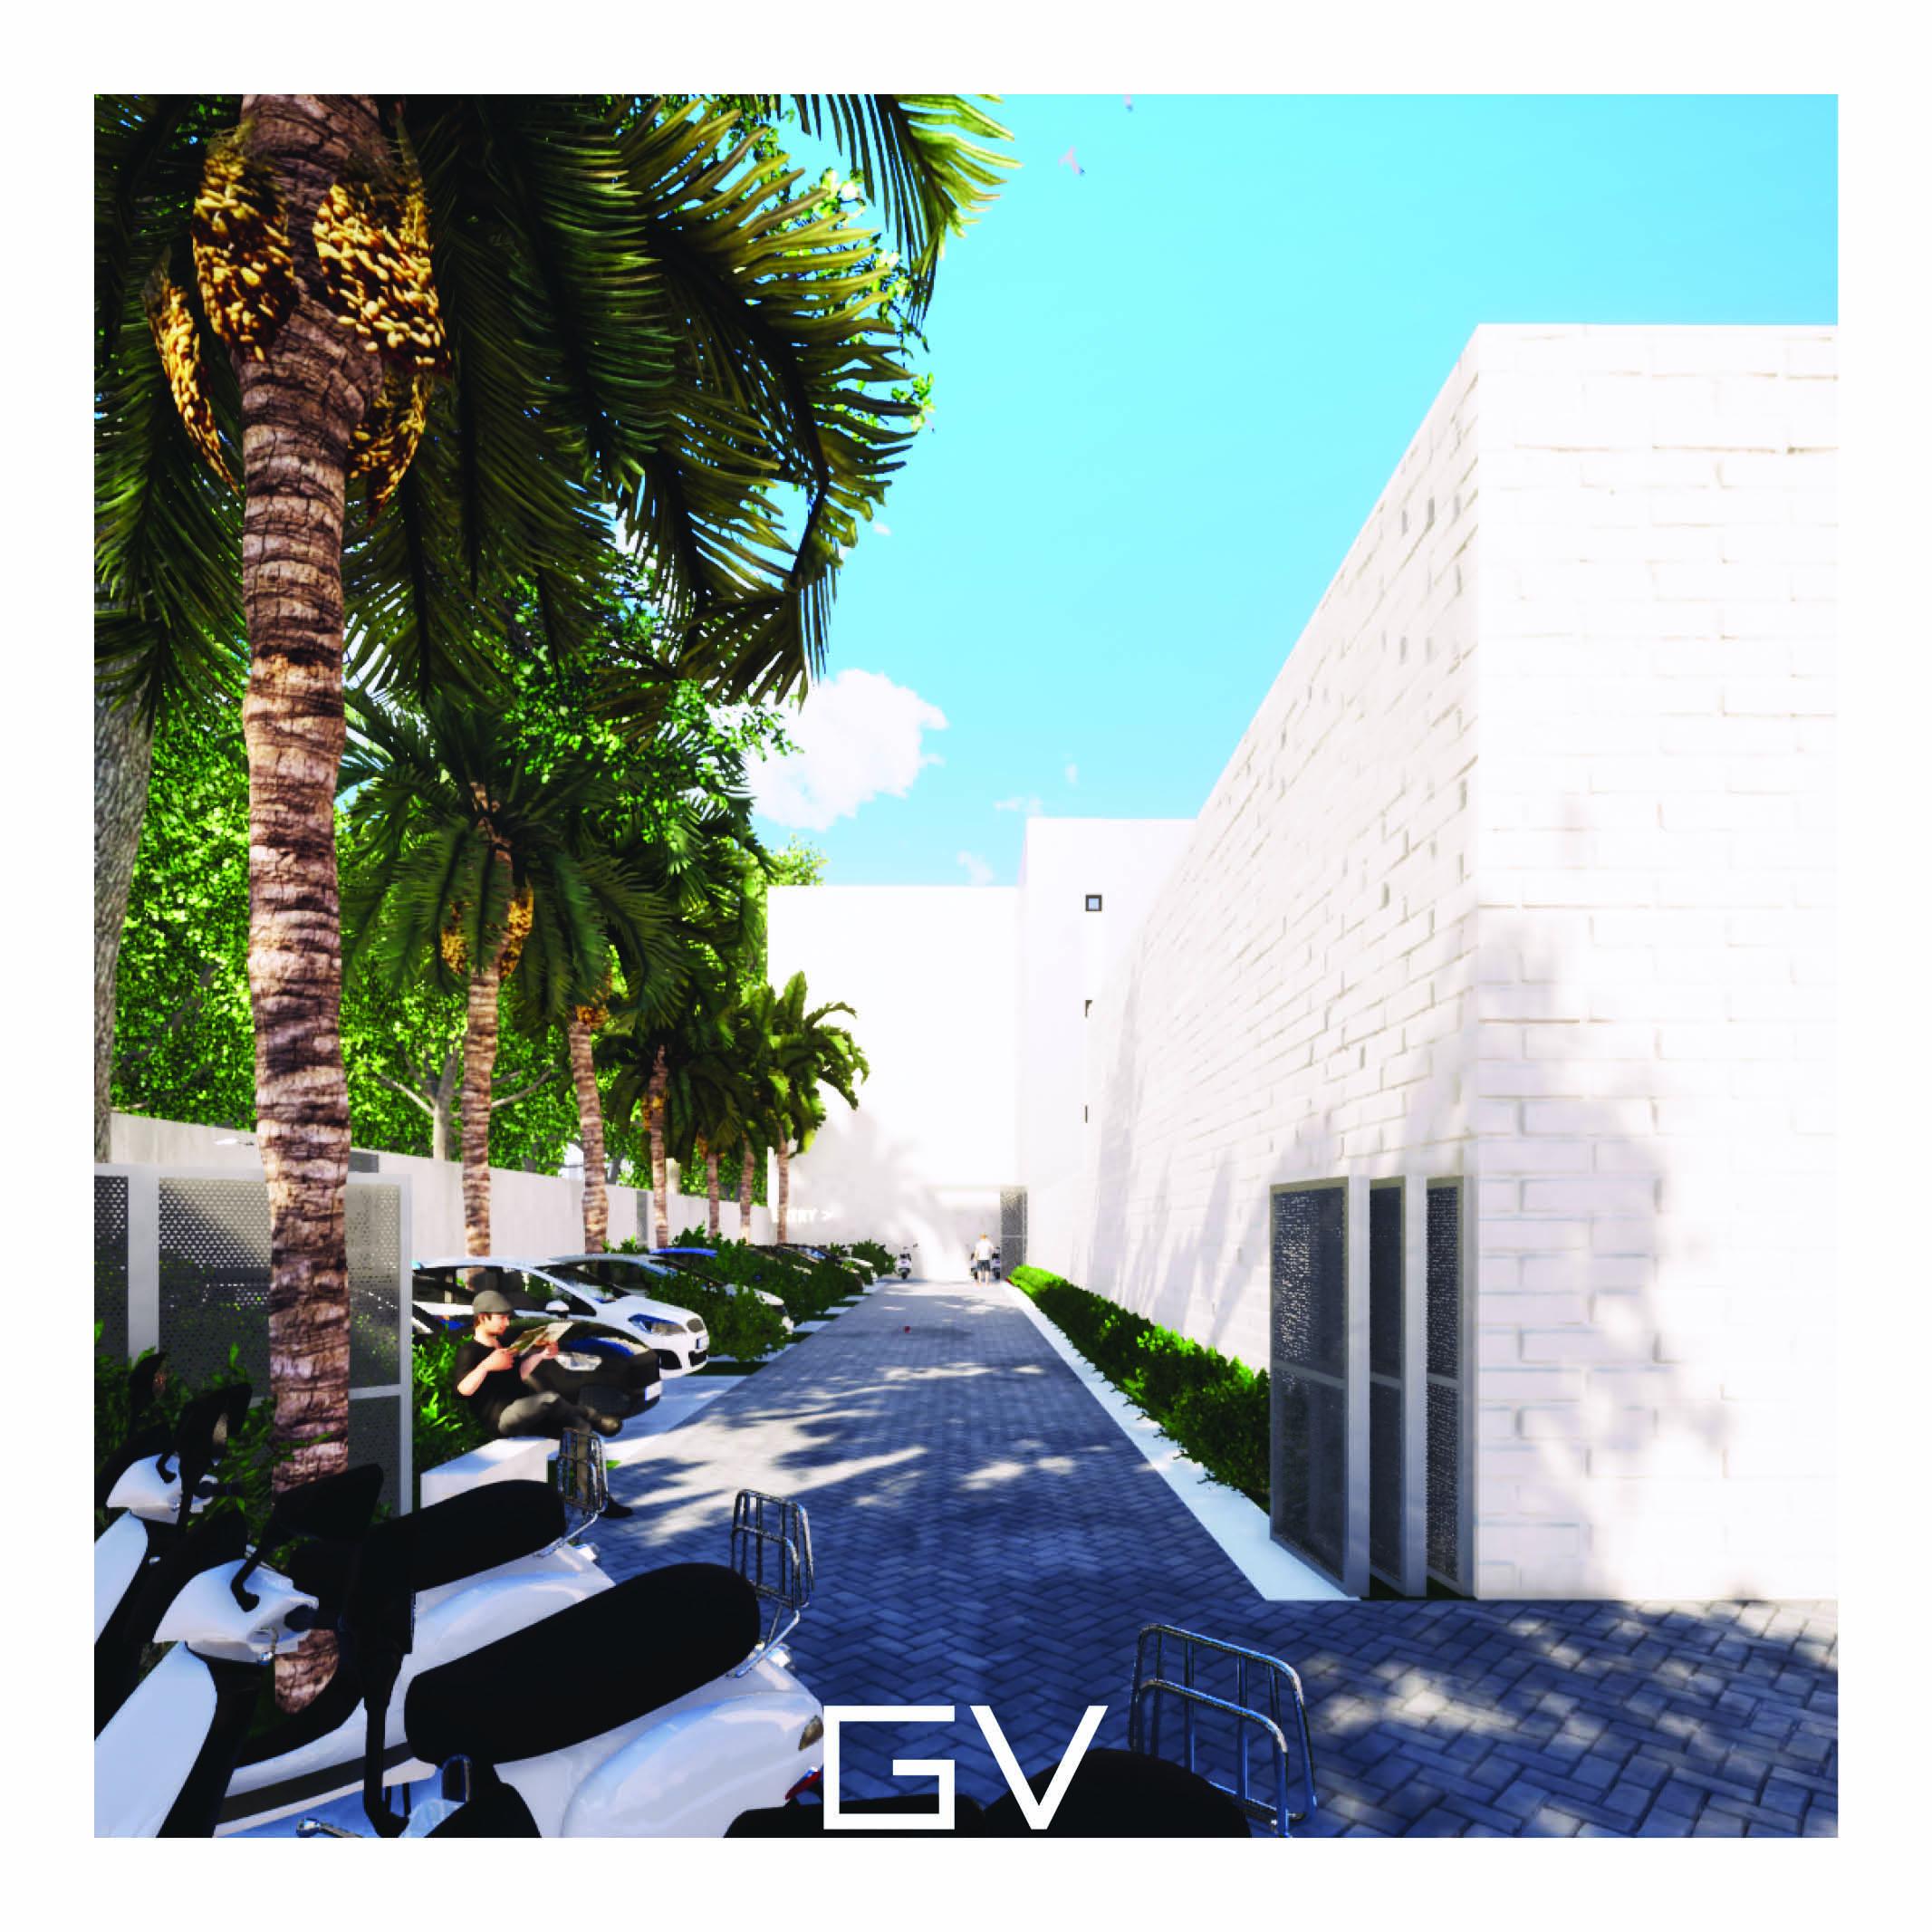 Gv Studio Kost Jababeka Cikarang, Bekasi, Jawa Barat, Indonesia Cikarang, Bekasi, Jawa Barat, Indonesia Gv-Studio-Kost-Jababeka Industrial  88231